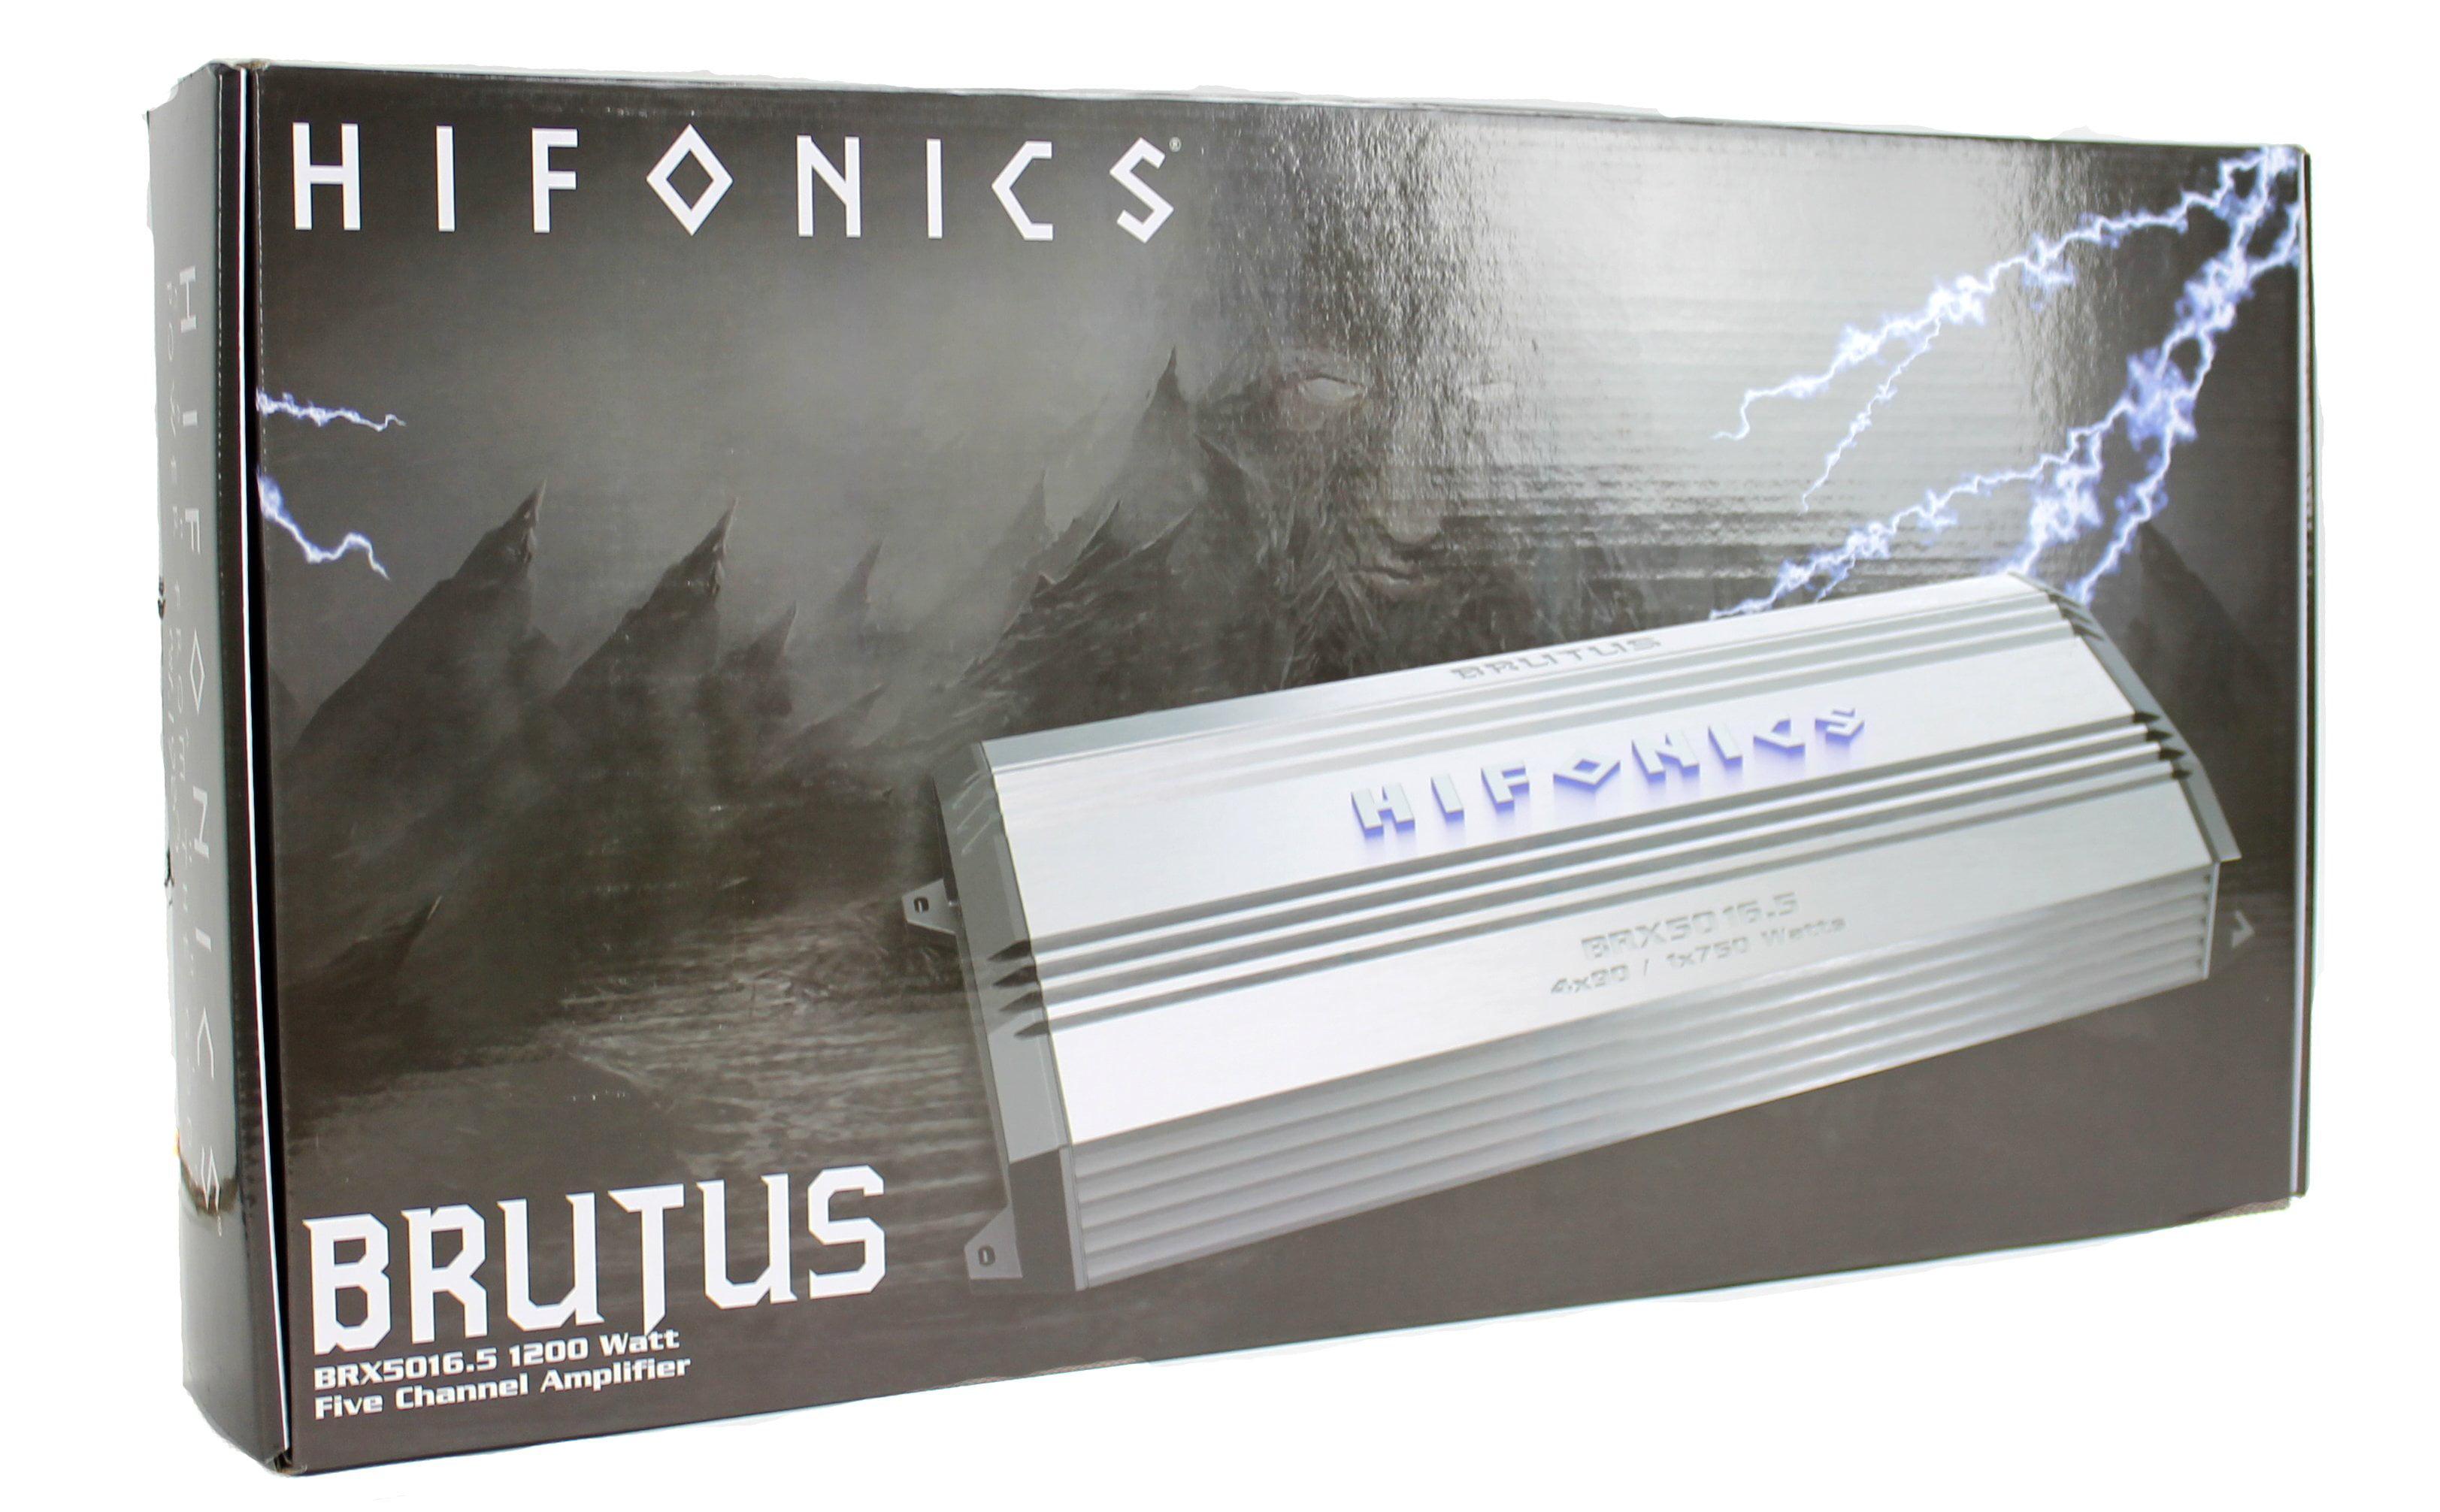 Hifonics Brutus Brx50165 1200 Watt Amp 5 Channel Car Audio 1200w Amplifier Vm 4gauge Wiring Kit